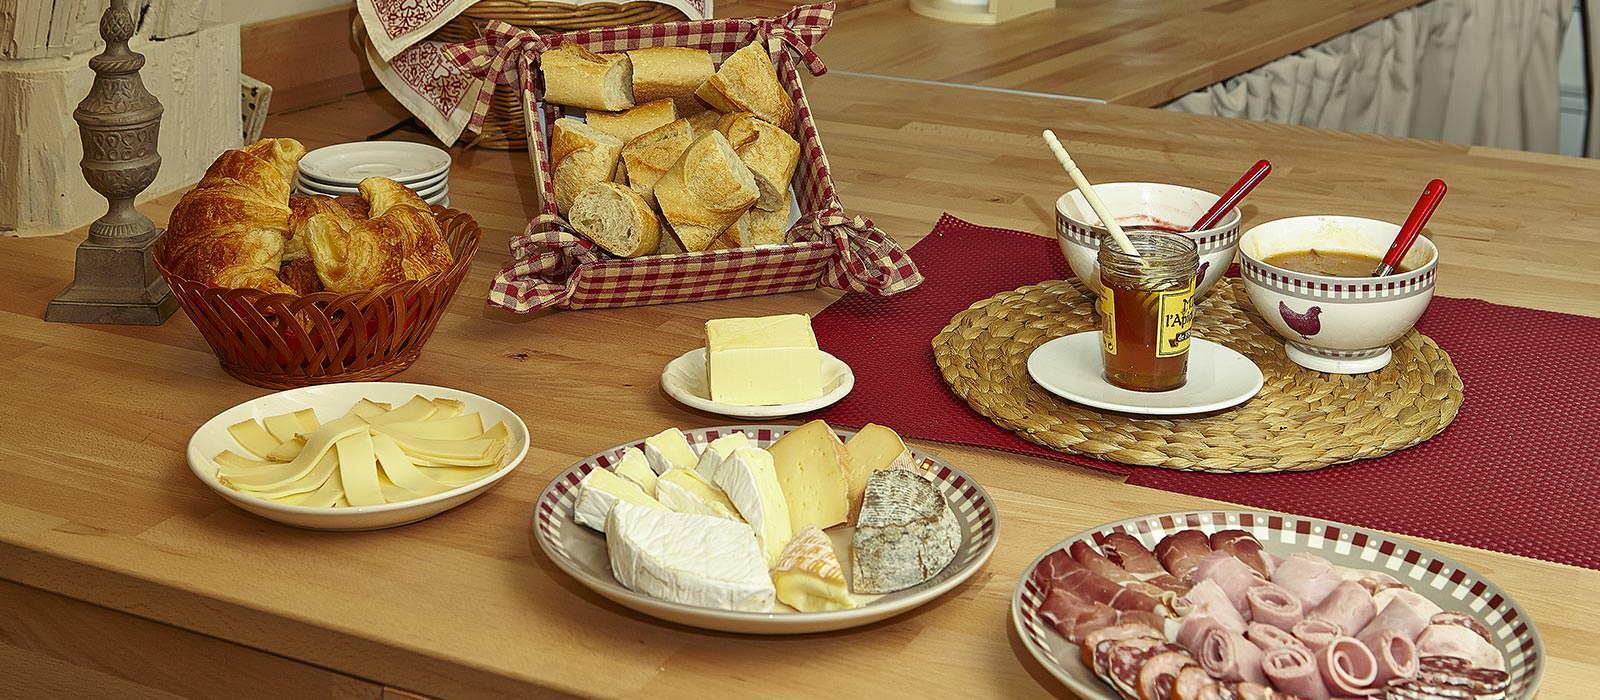 Bed breakfast bellevue elsass bellevue alsace - Chambre d hote en alsace ...